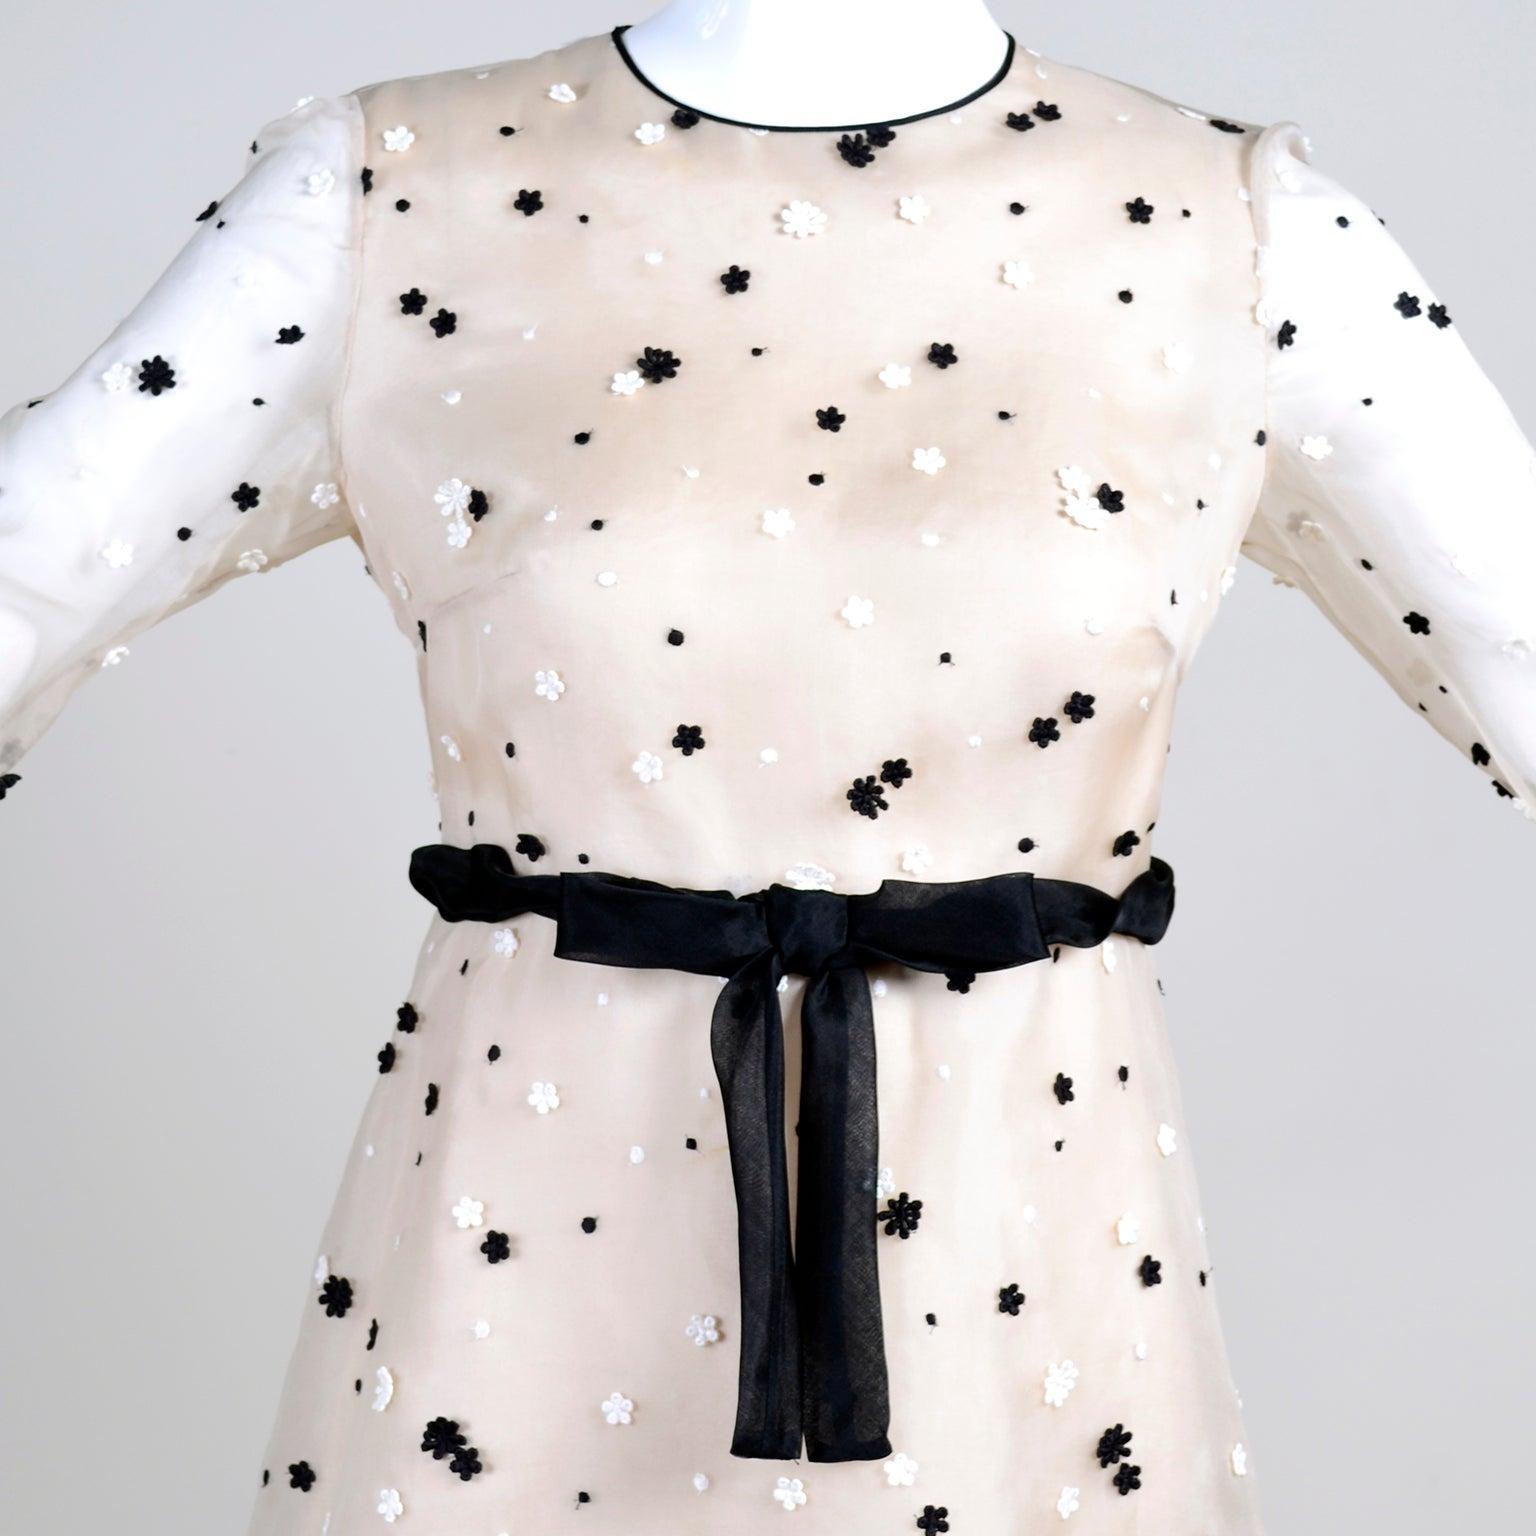 Documented 2011 Valentino Dress In Cream Organza W Black And White